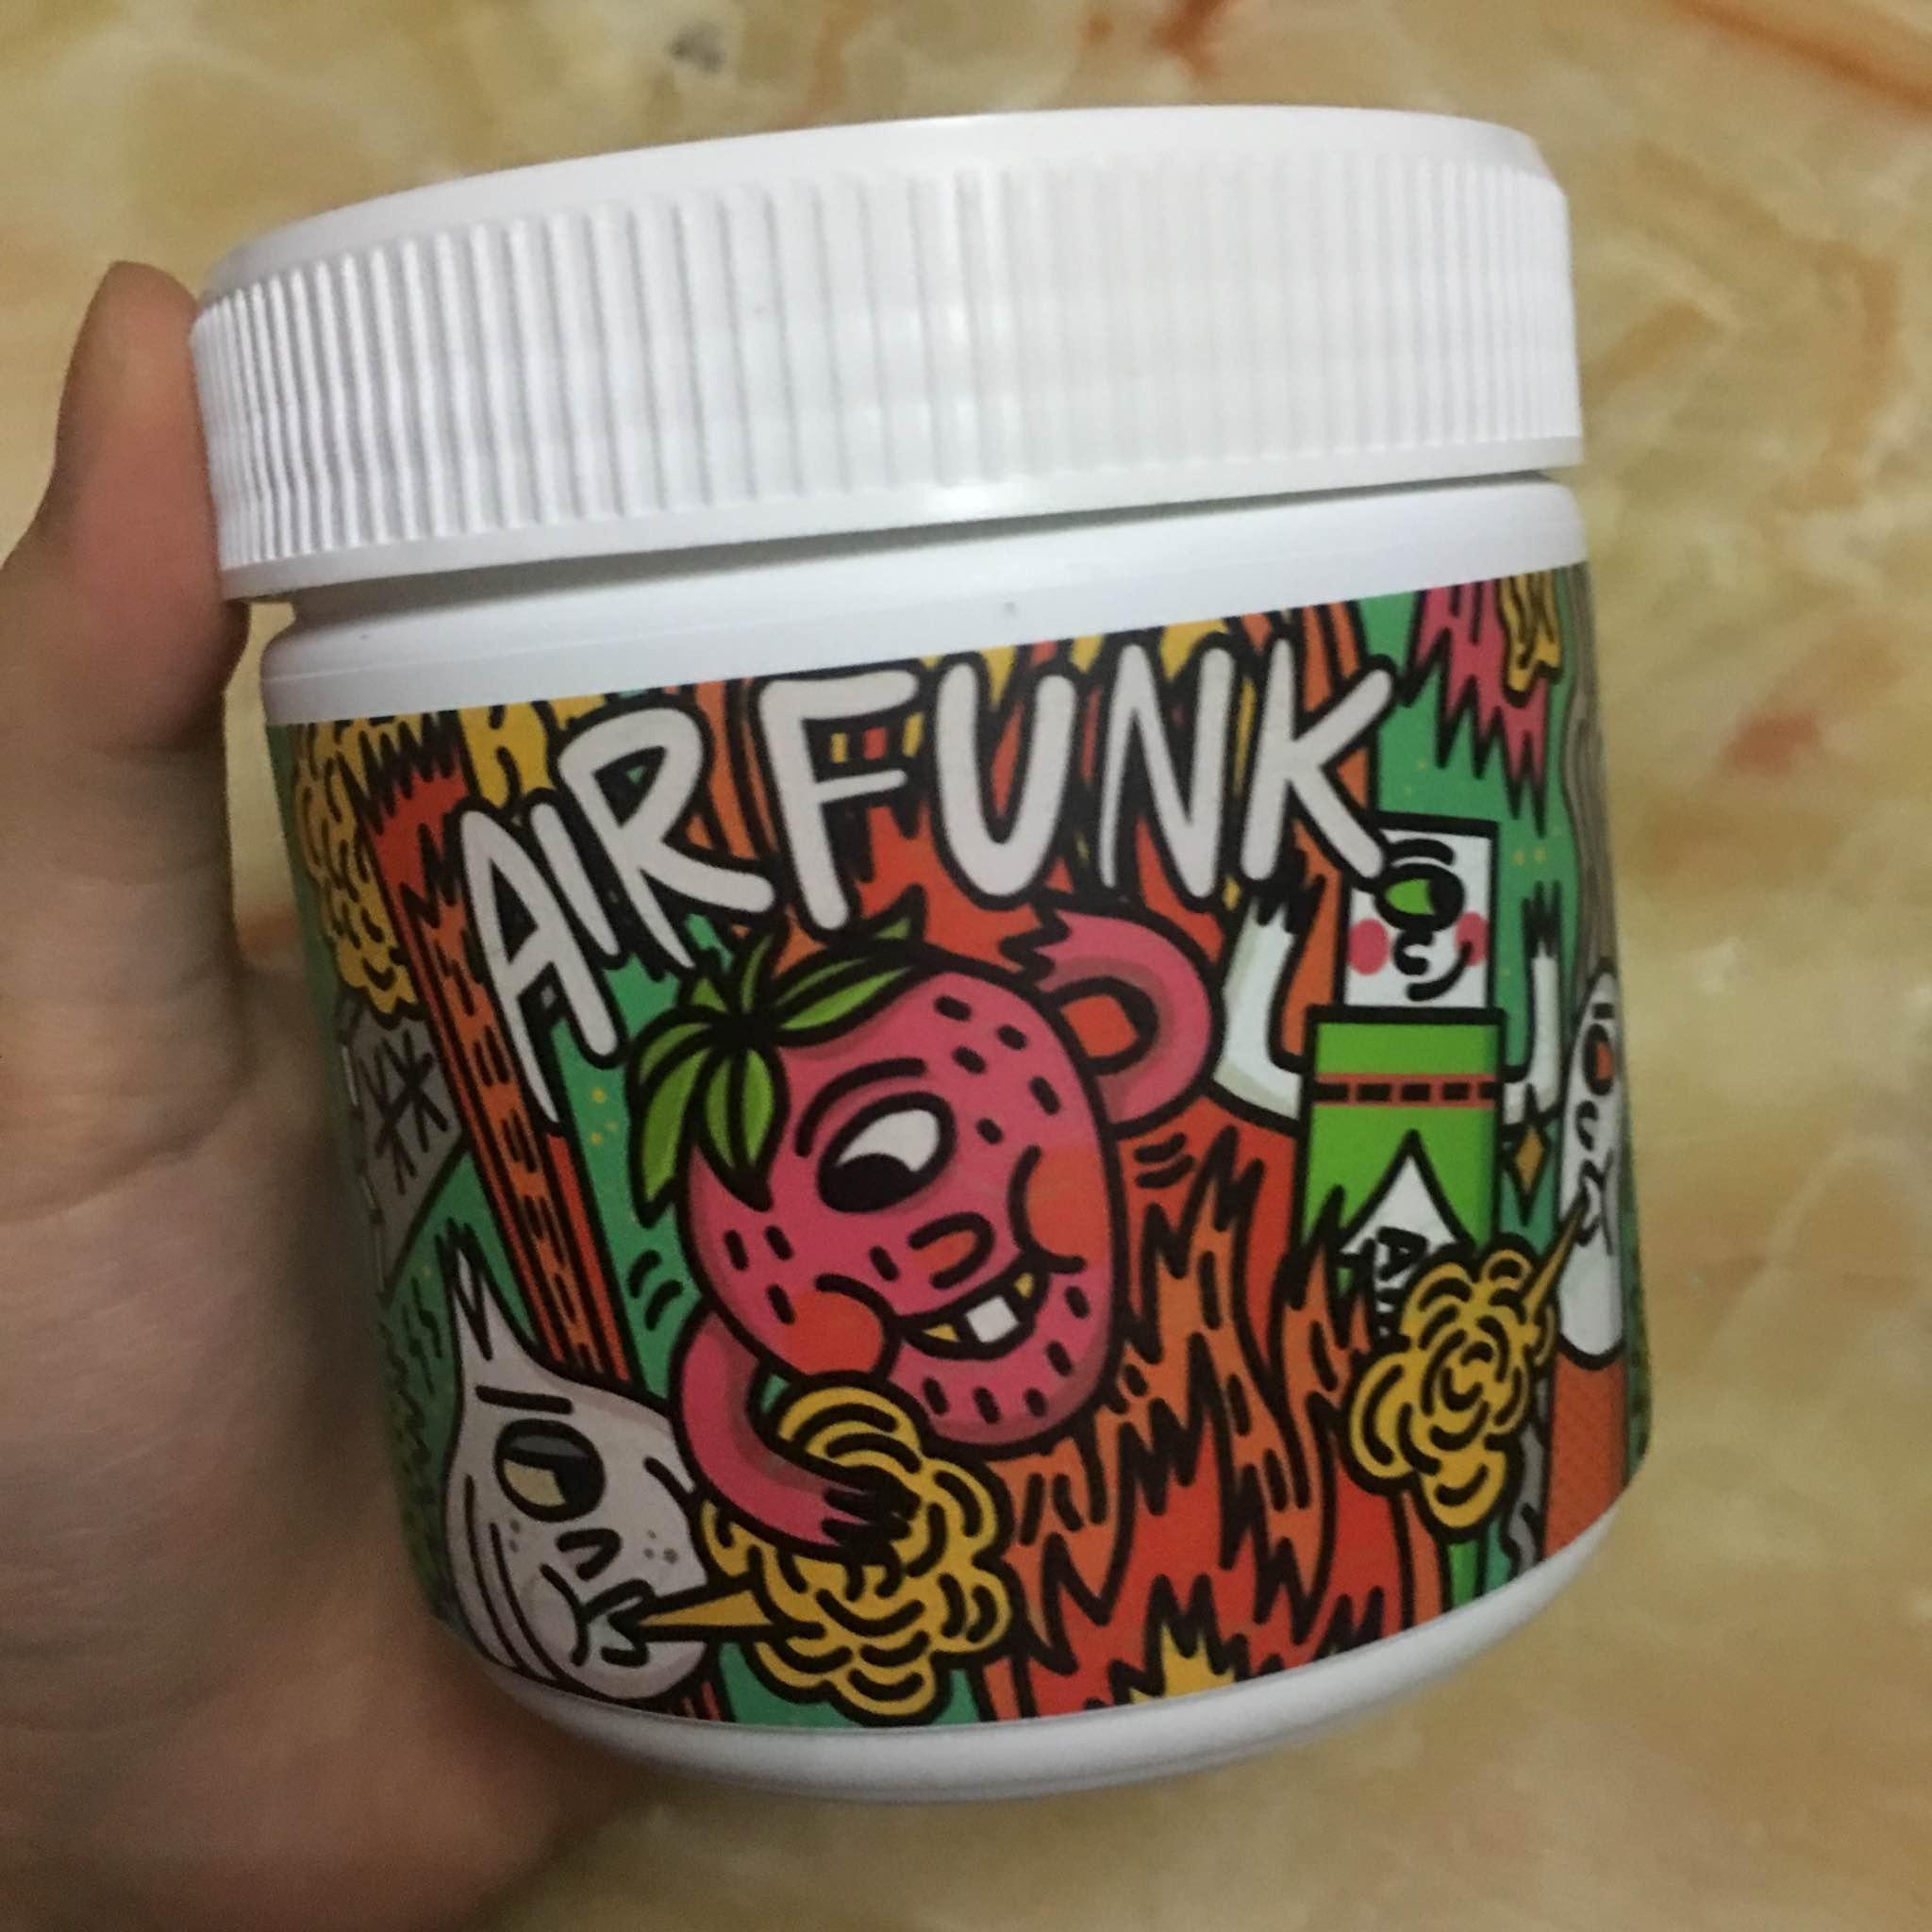 Air Funk这个吸收甲醛的东西用了很好,车内气味没了很多